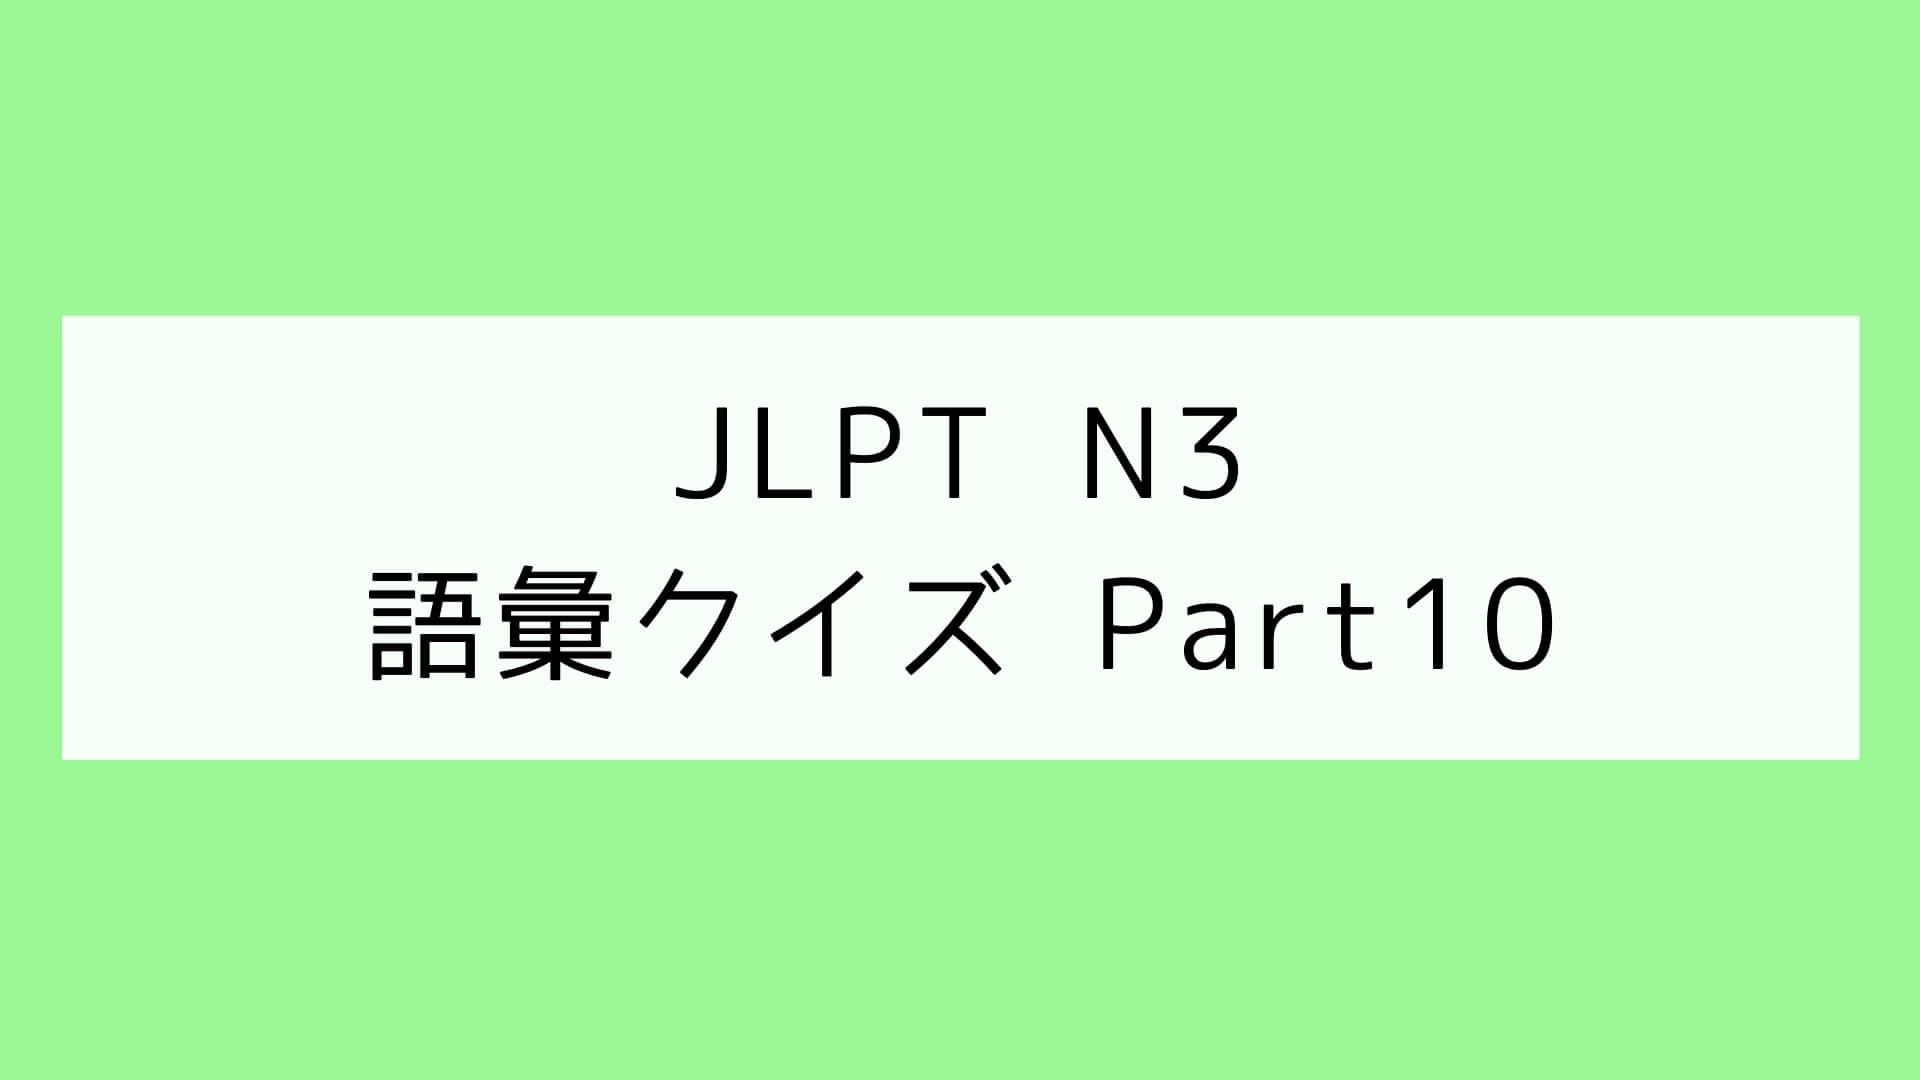 【JLPT N3】語彙クイズ Part10